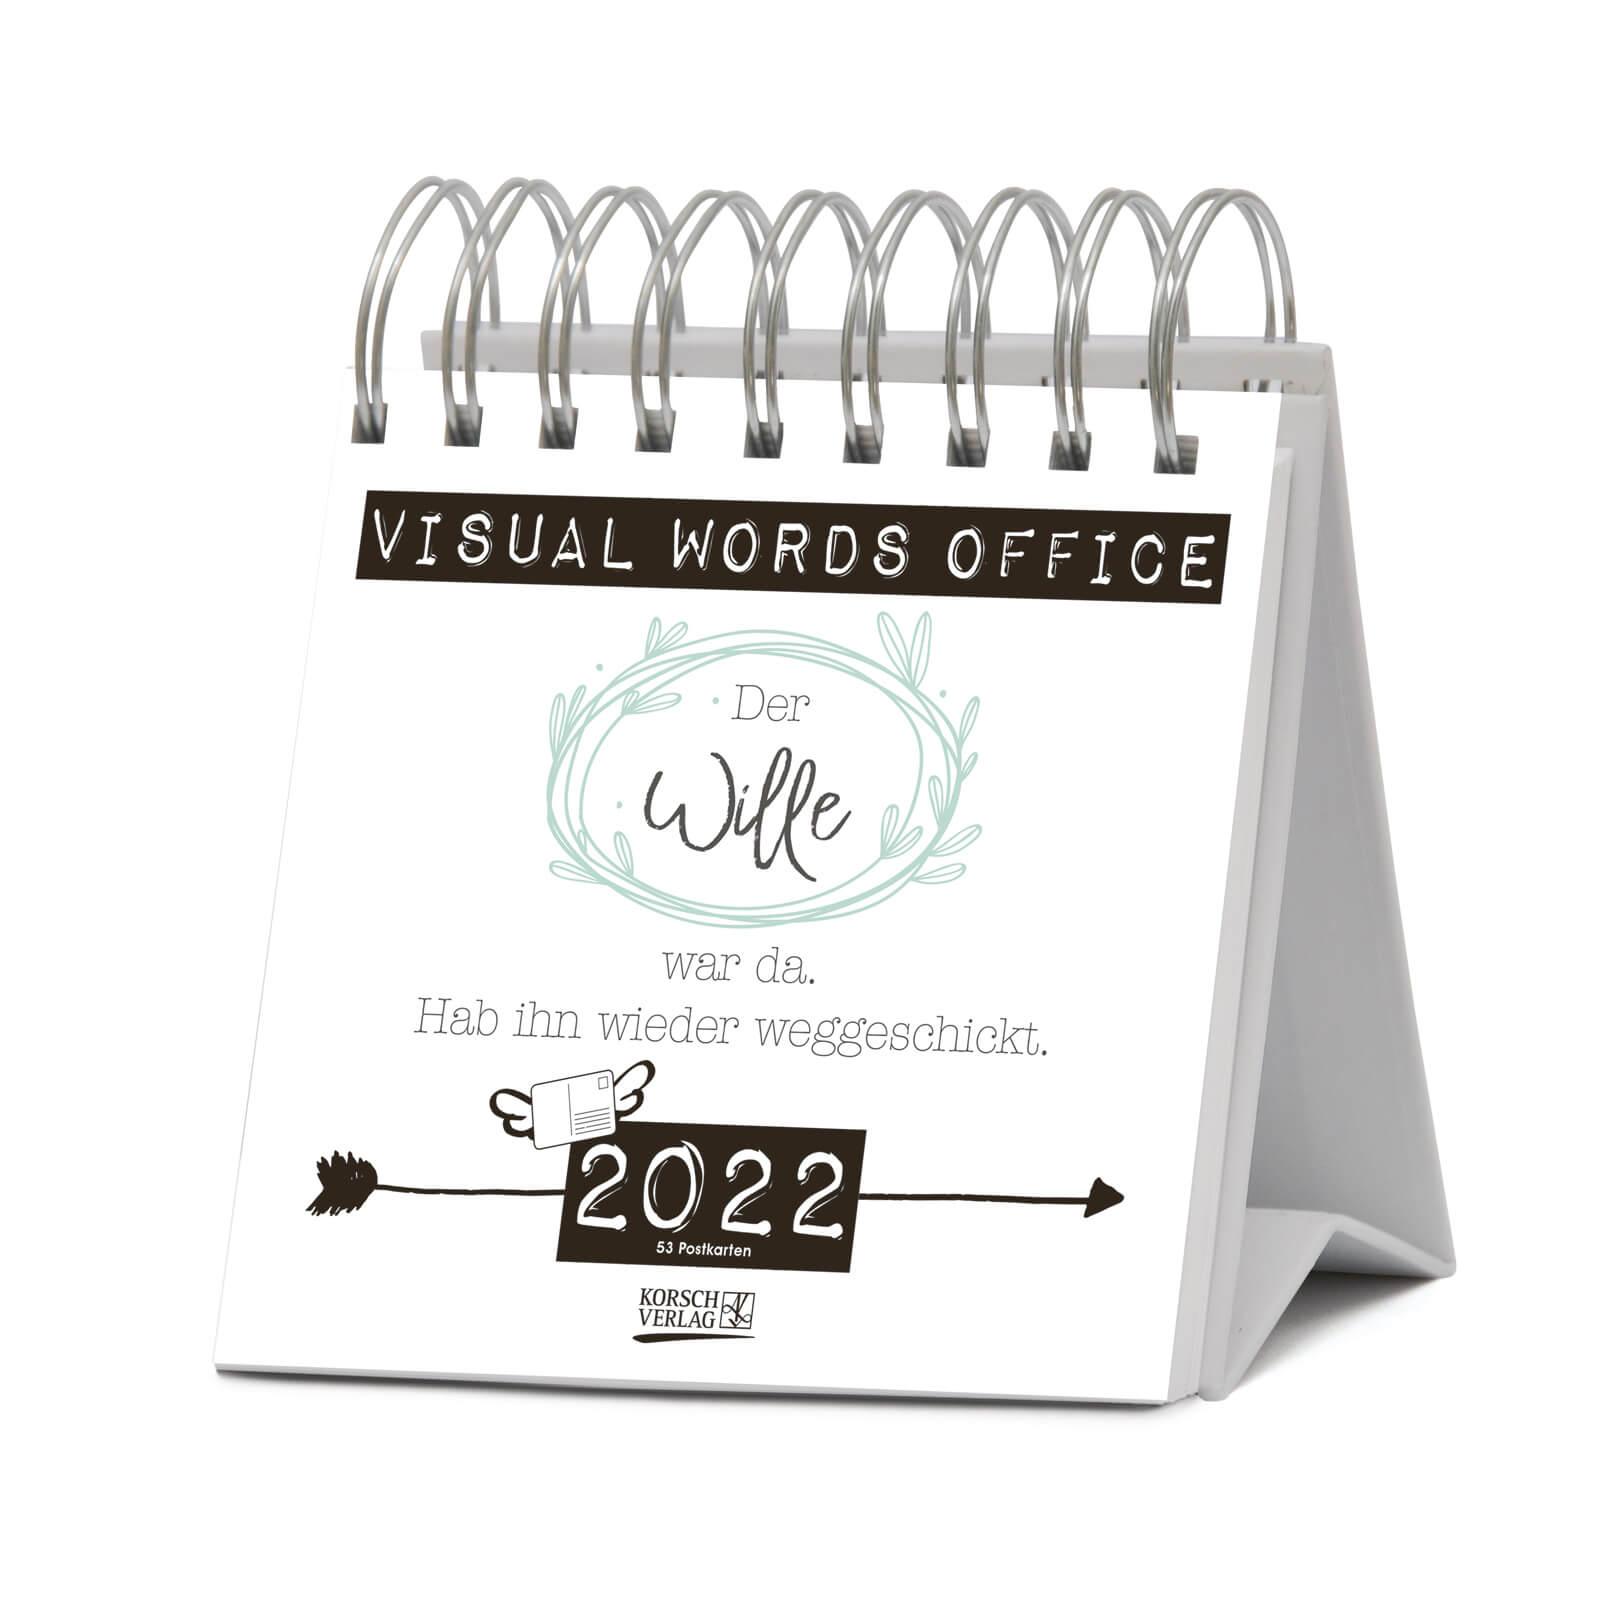 Visual Words Office 2022, Art. 235822